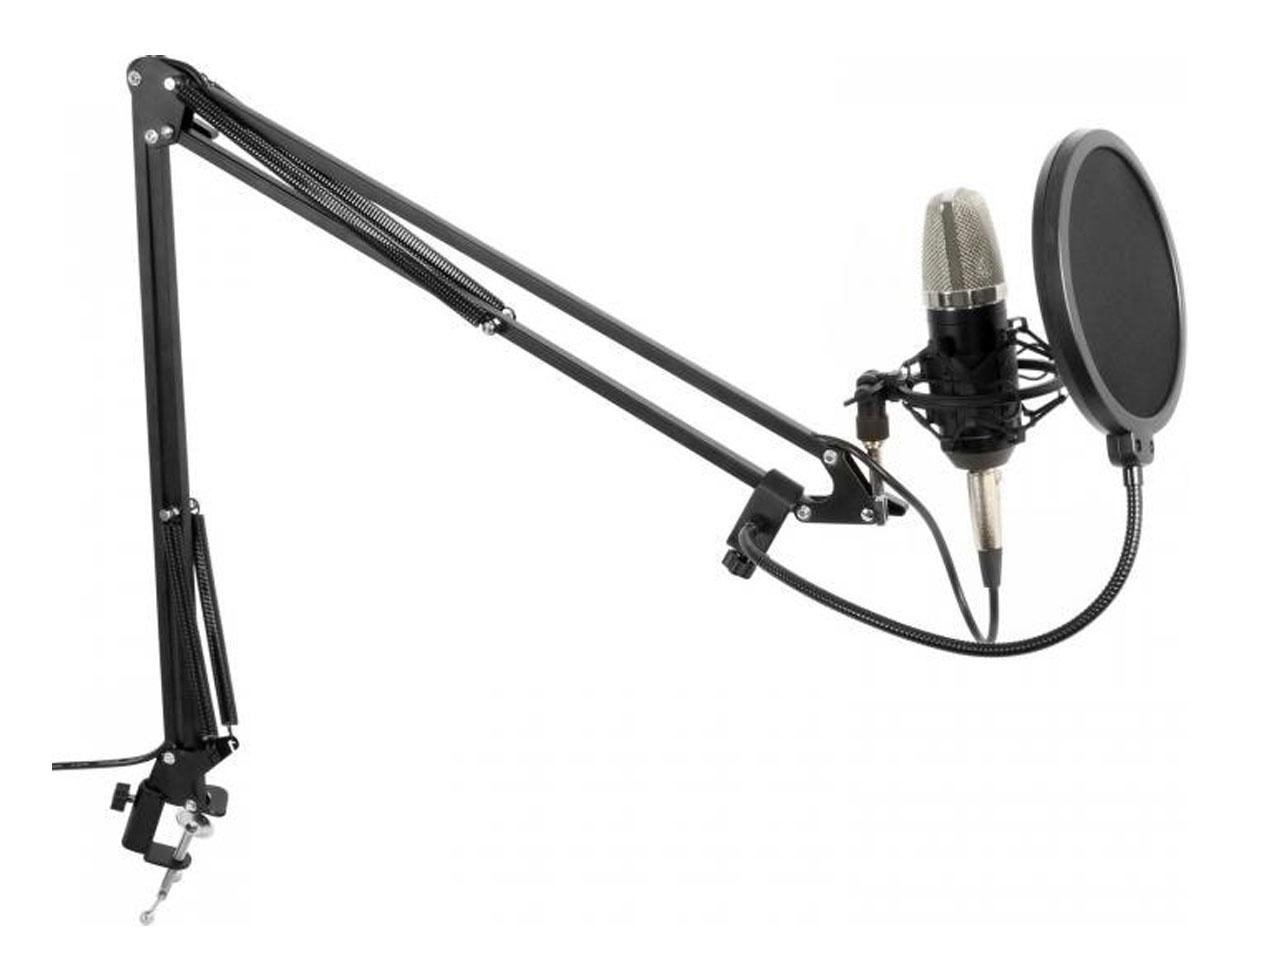 Studiový mikrofon VONYX Onyx Studio Set 173.503 + záruka 3 roky!